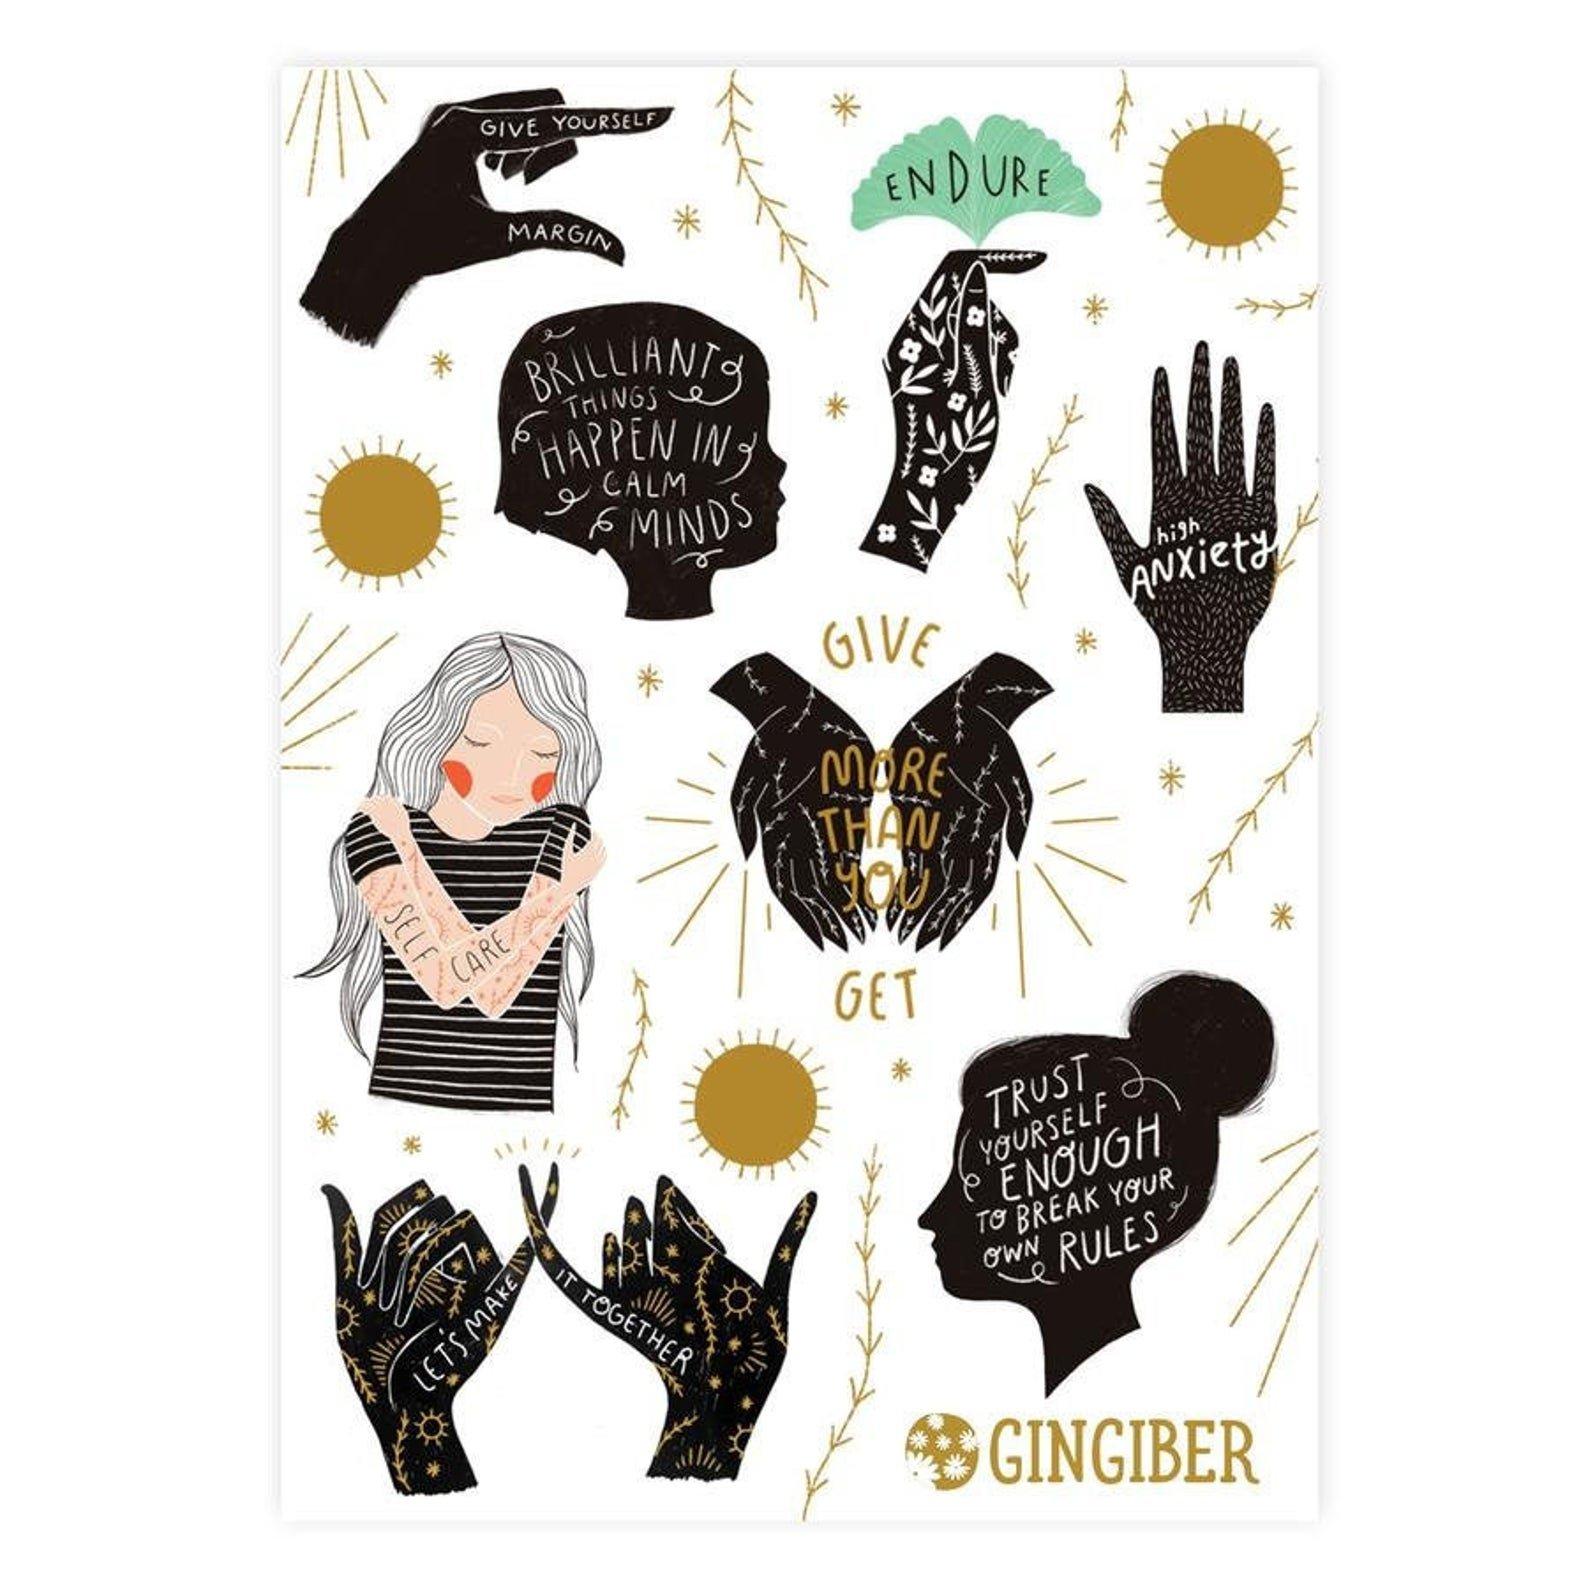 Gingiber - Sticker Sheet - Encouragement